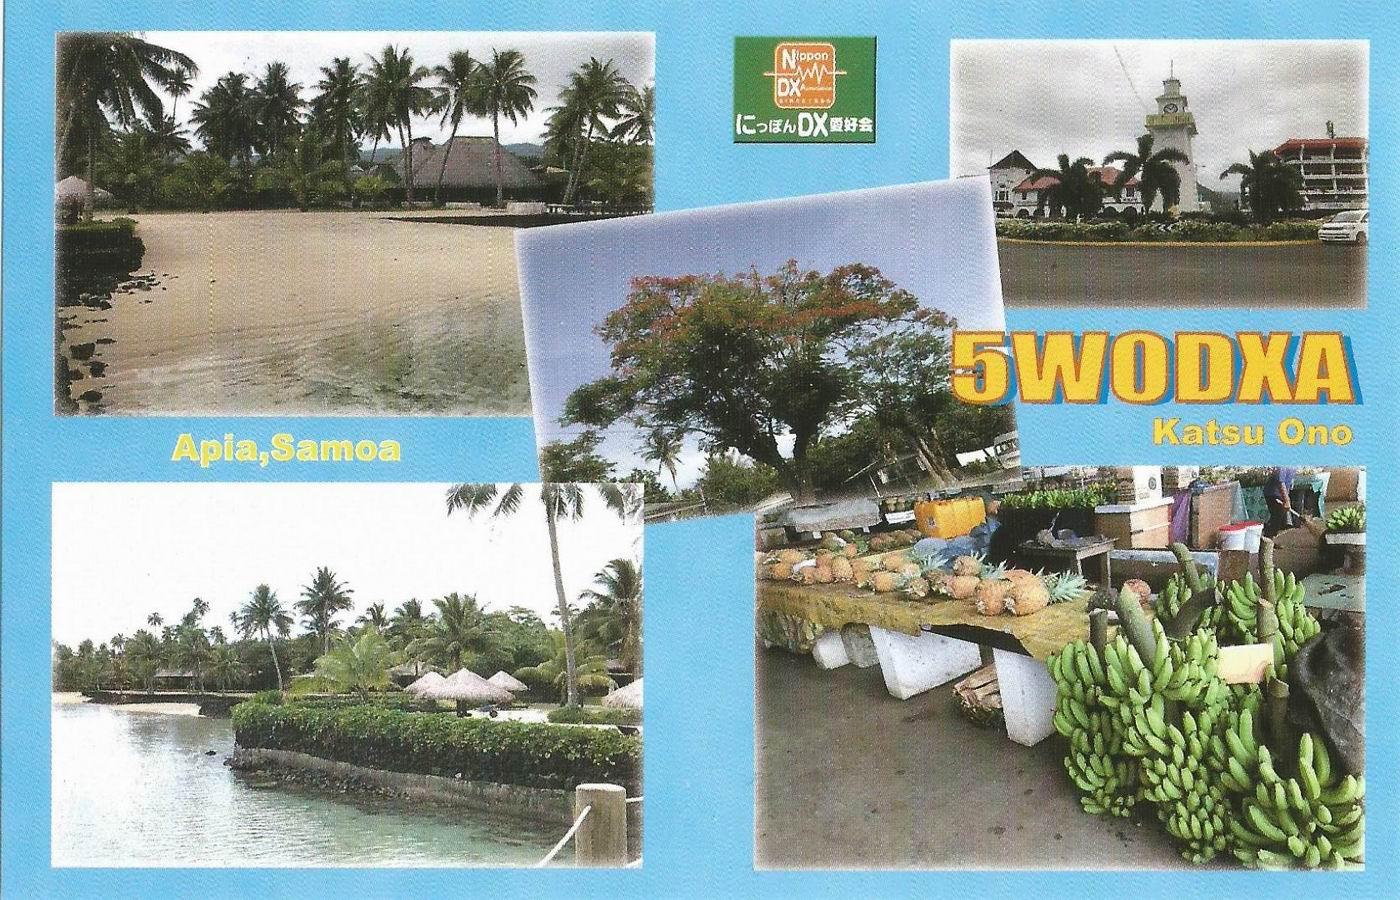 Нажмите на изображение для увеличения.  Название:5W0DXA  Samoa.jpg Просмотров:3 Размер:316.2 Кб ID:203908